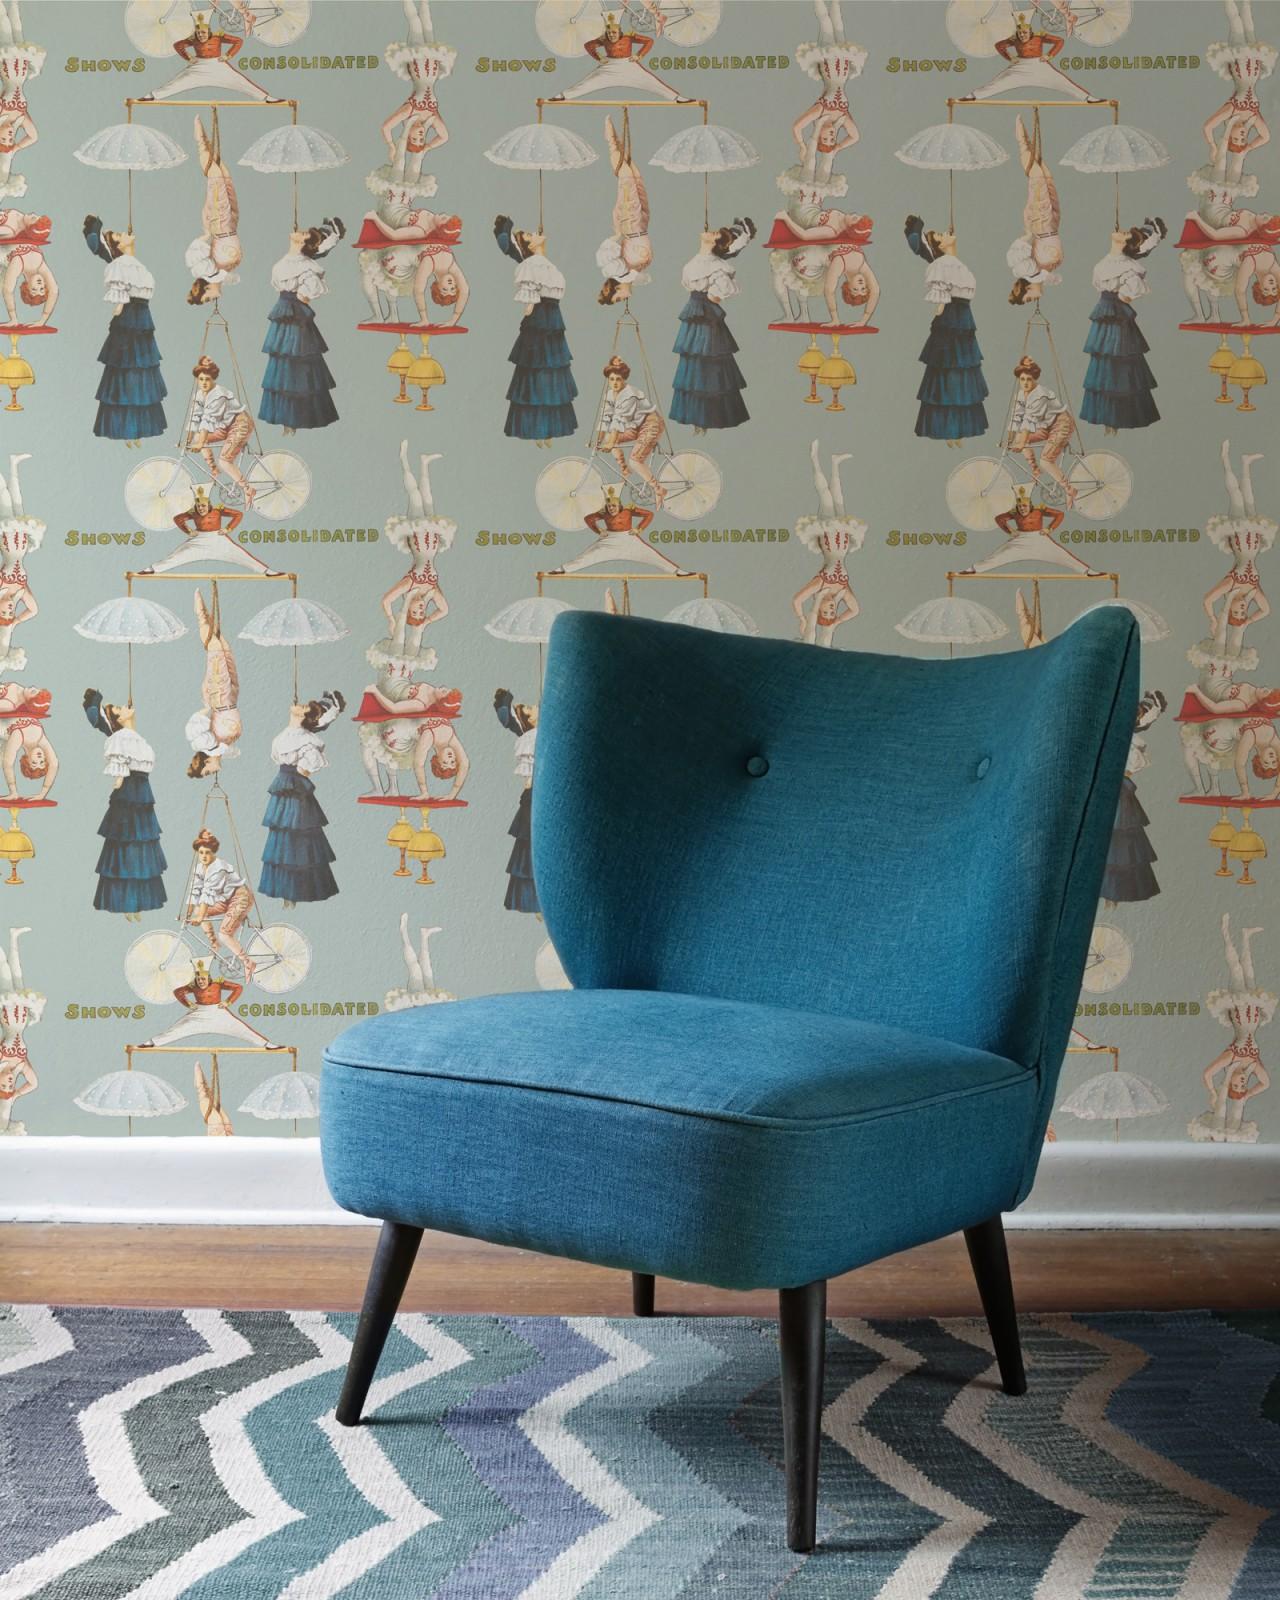 THE GREAT SHOW Blue Premium Wallpaper